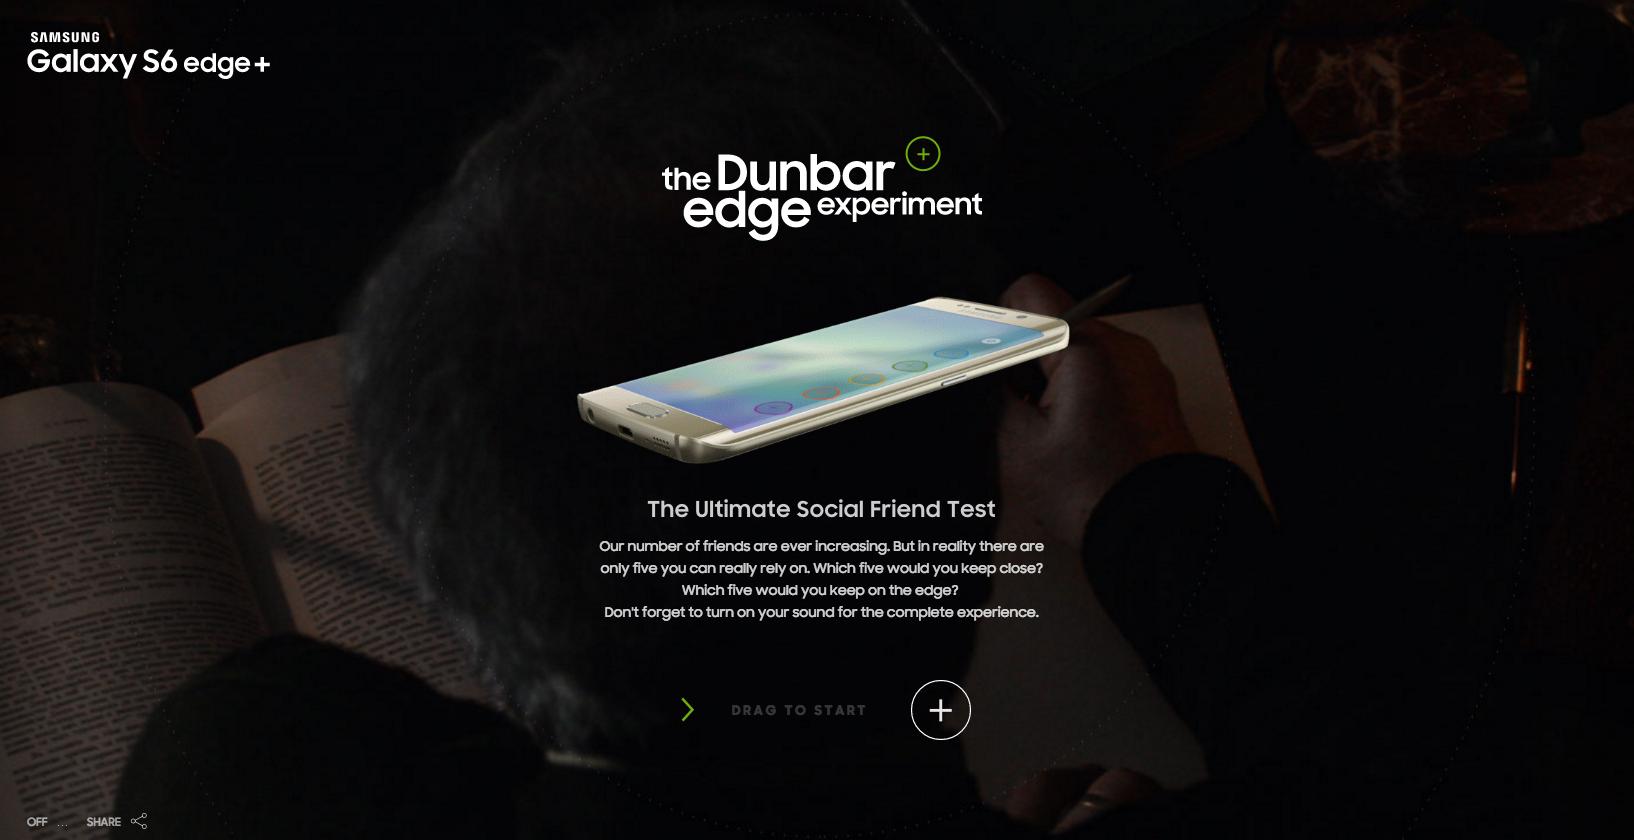 samsung-the dunbar edge experiment-wcie1